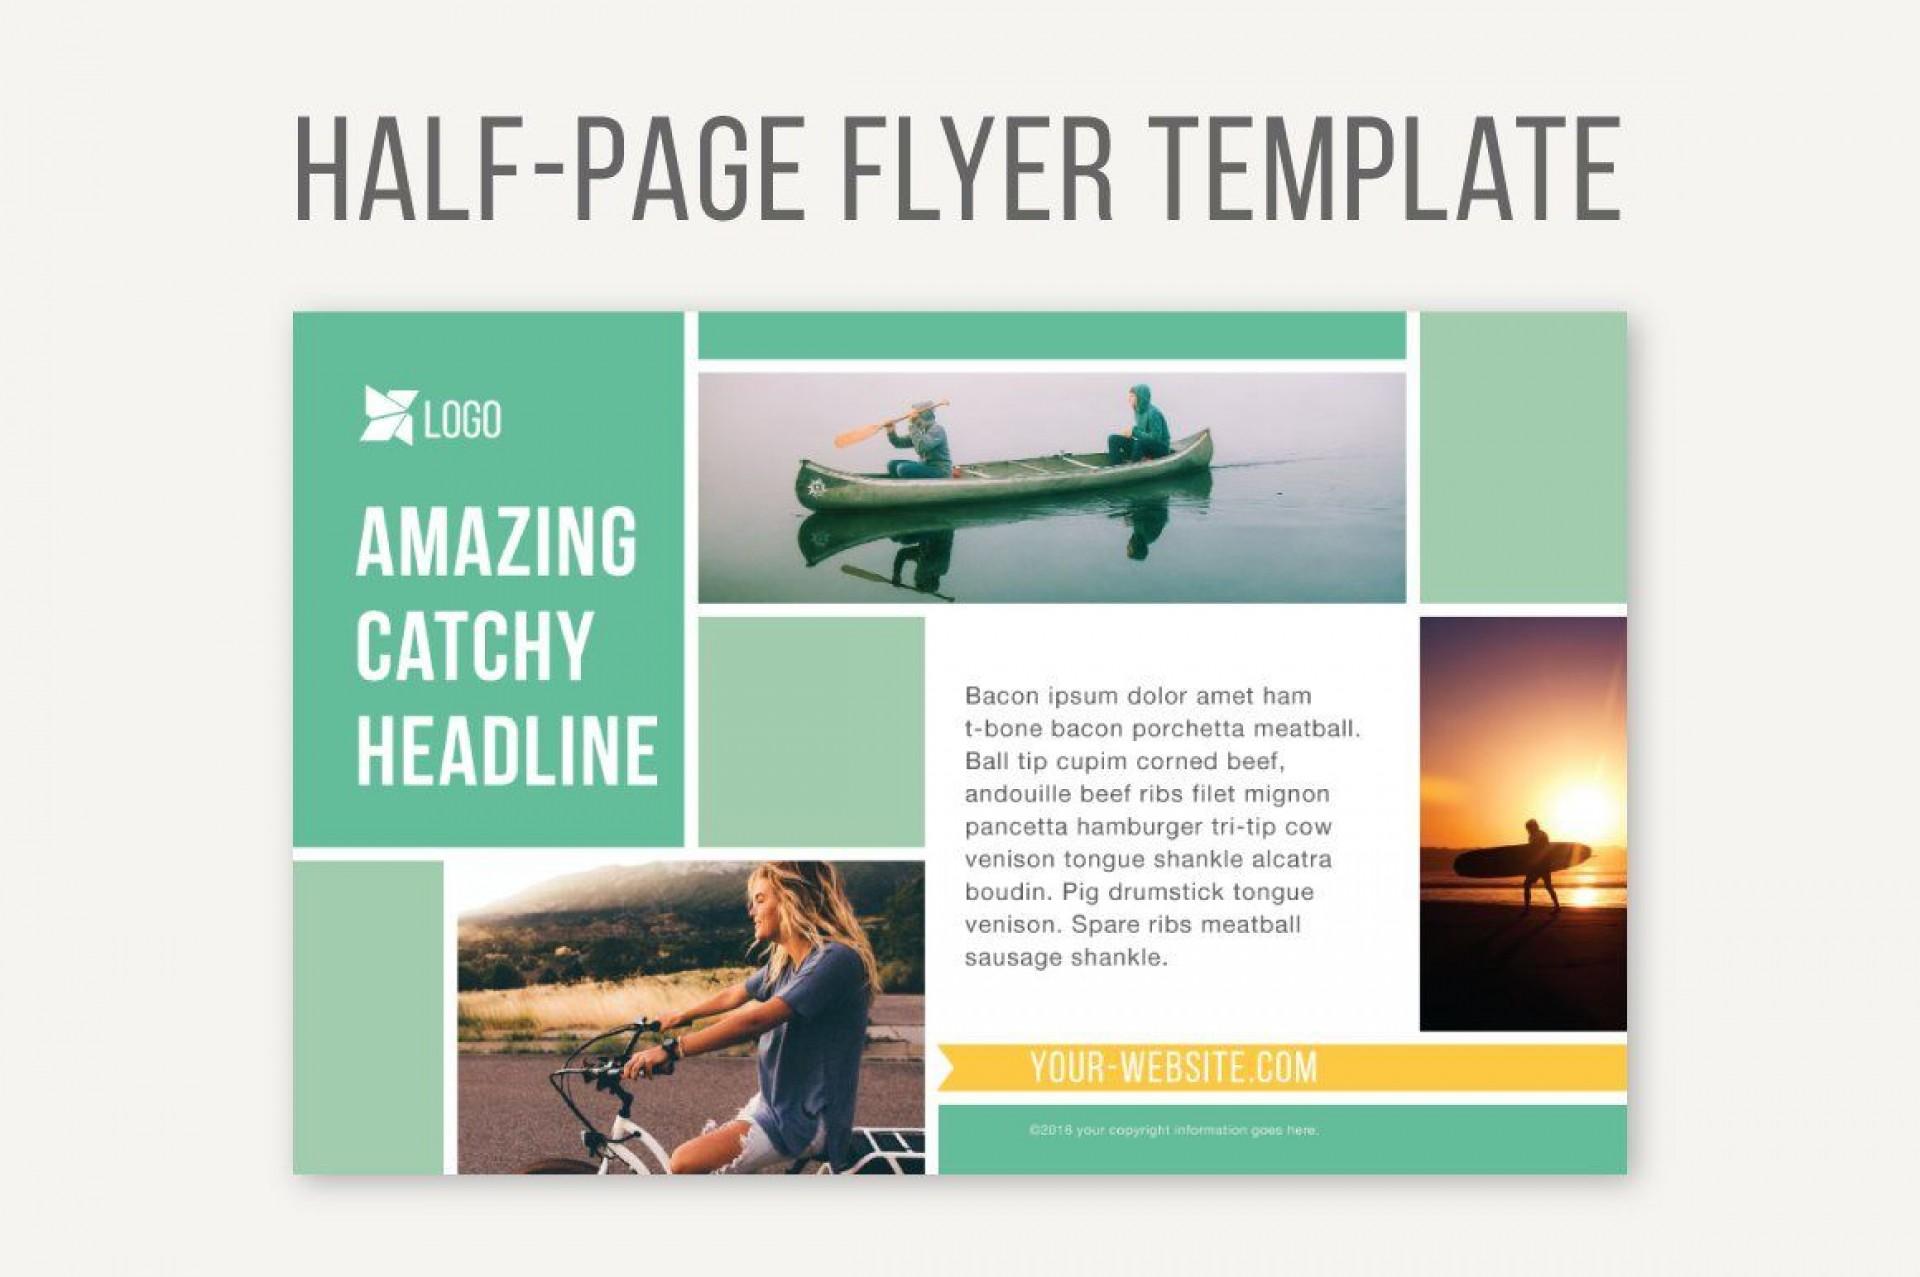 009 Phenomenal Half Page Flyer Template Inspiration  Templates Google Doc Free Word Canva1920